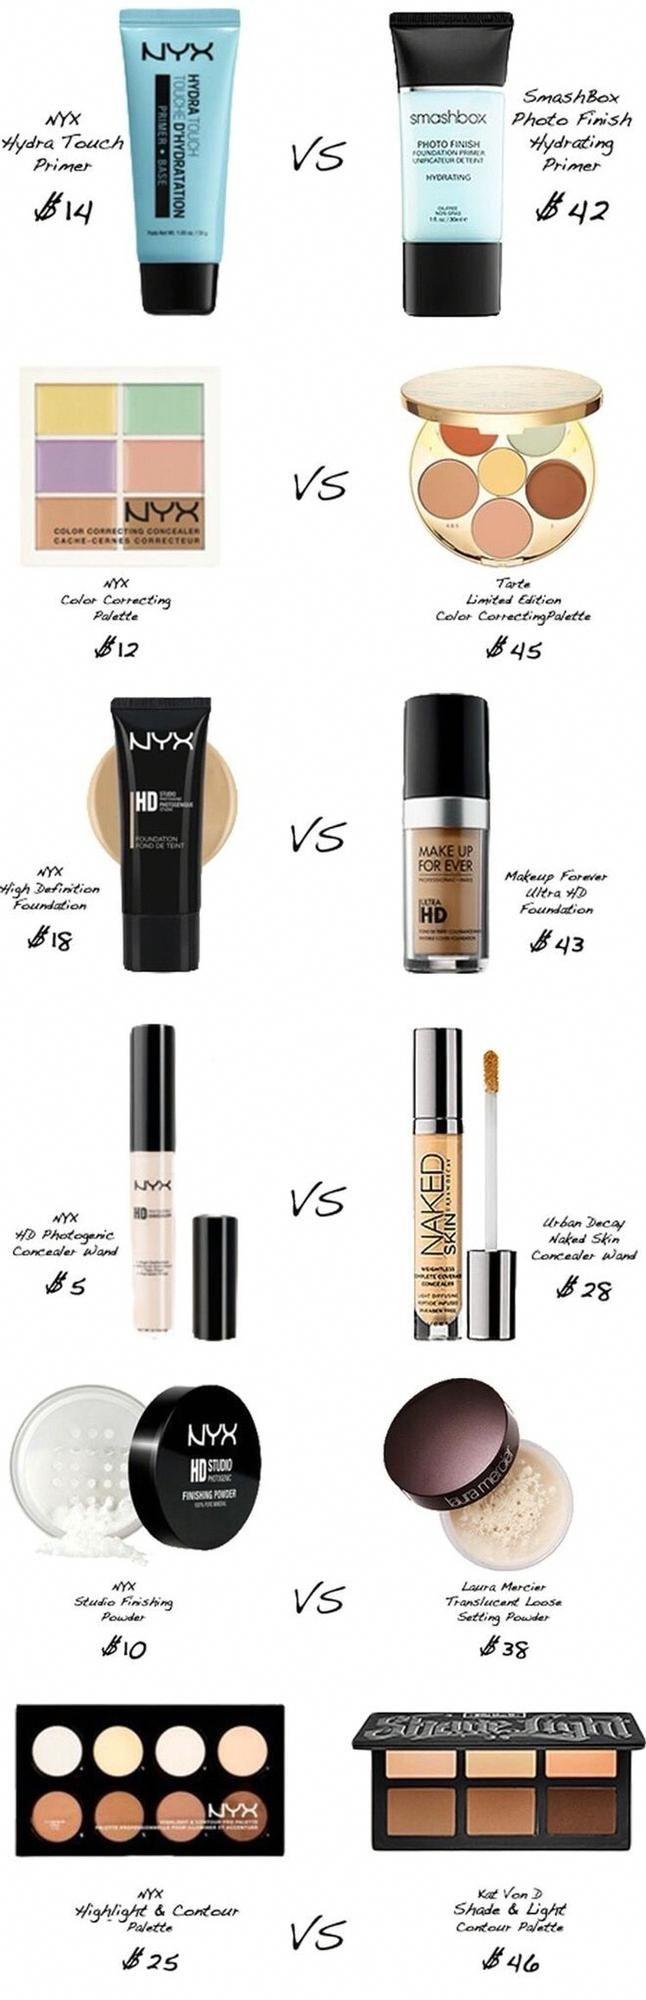 Makeup Revolution Obsession Makeup Bag Target! Makeup